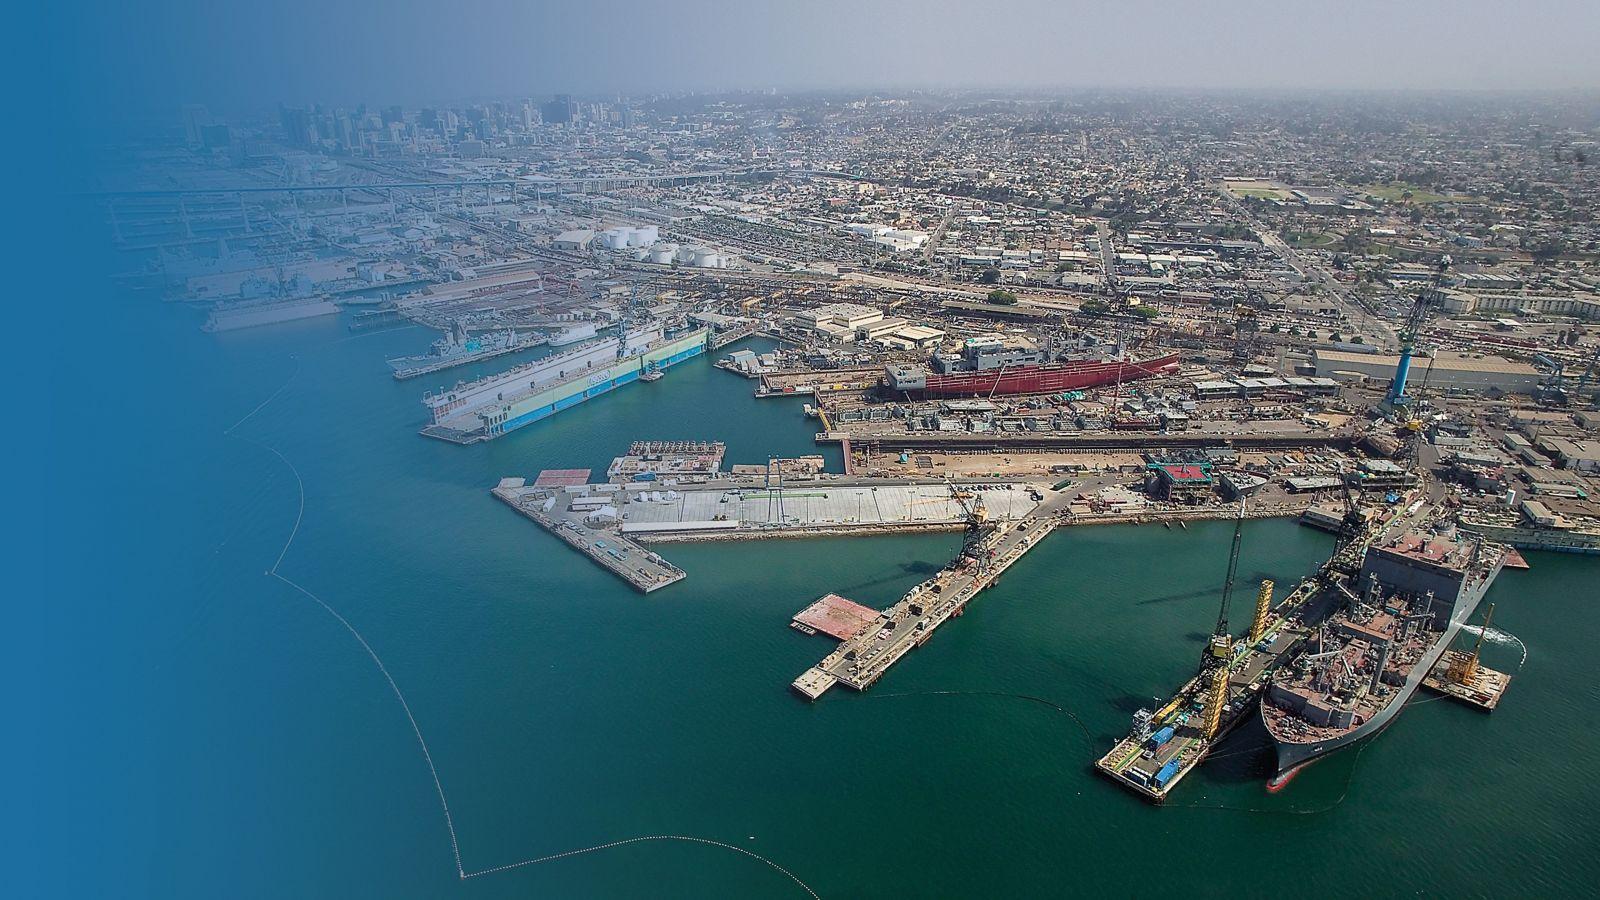 NASSCO San Diego Harbor